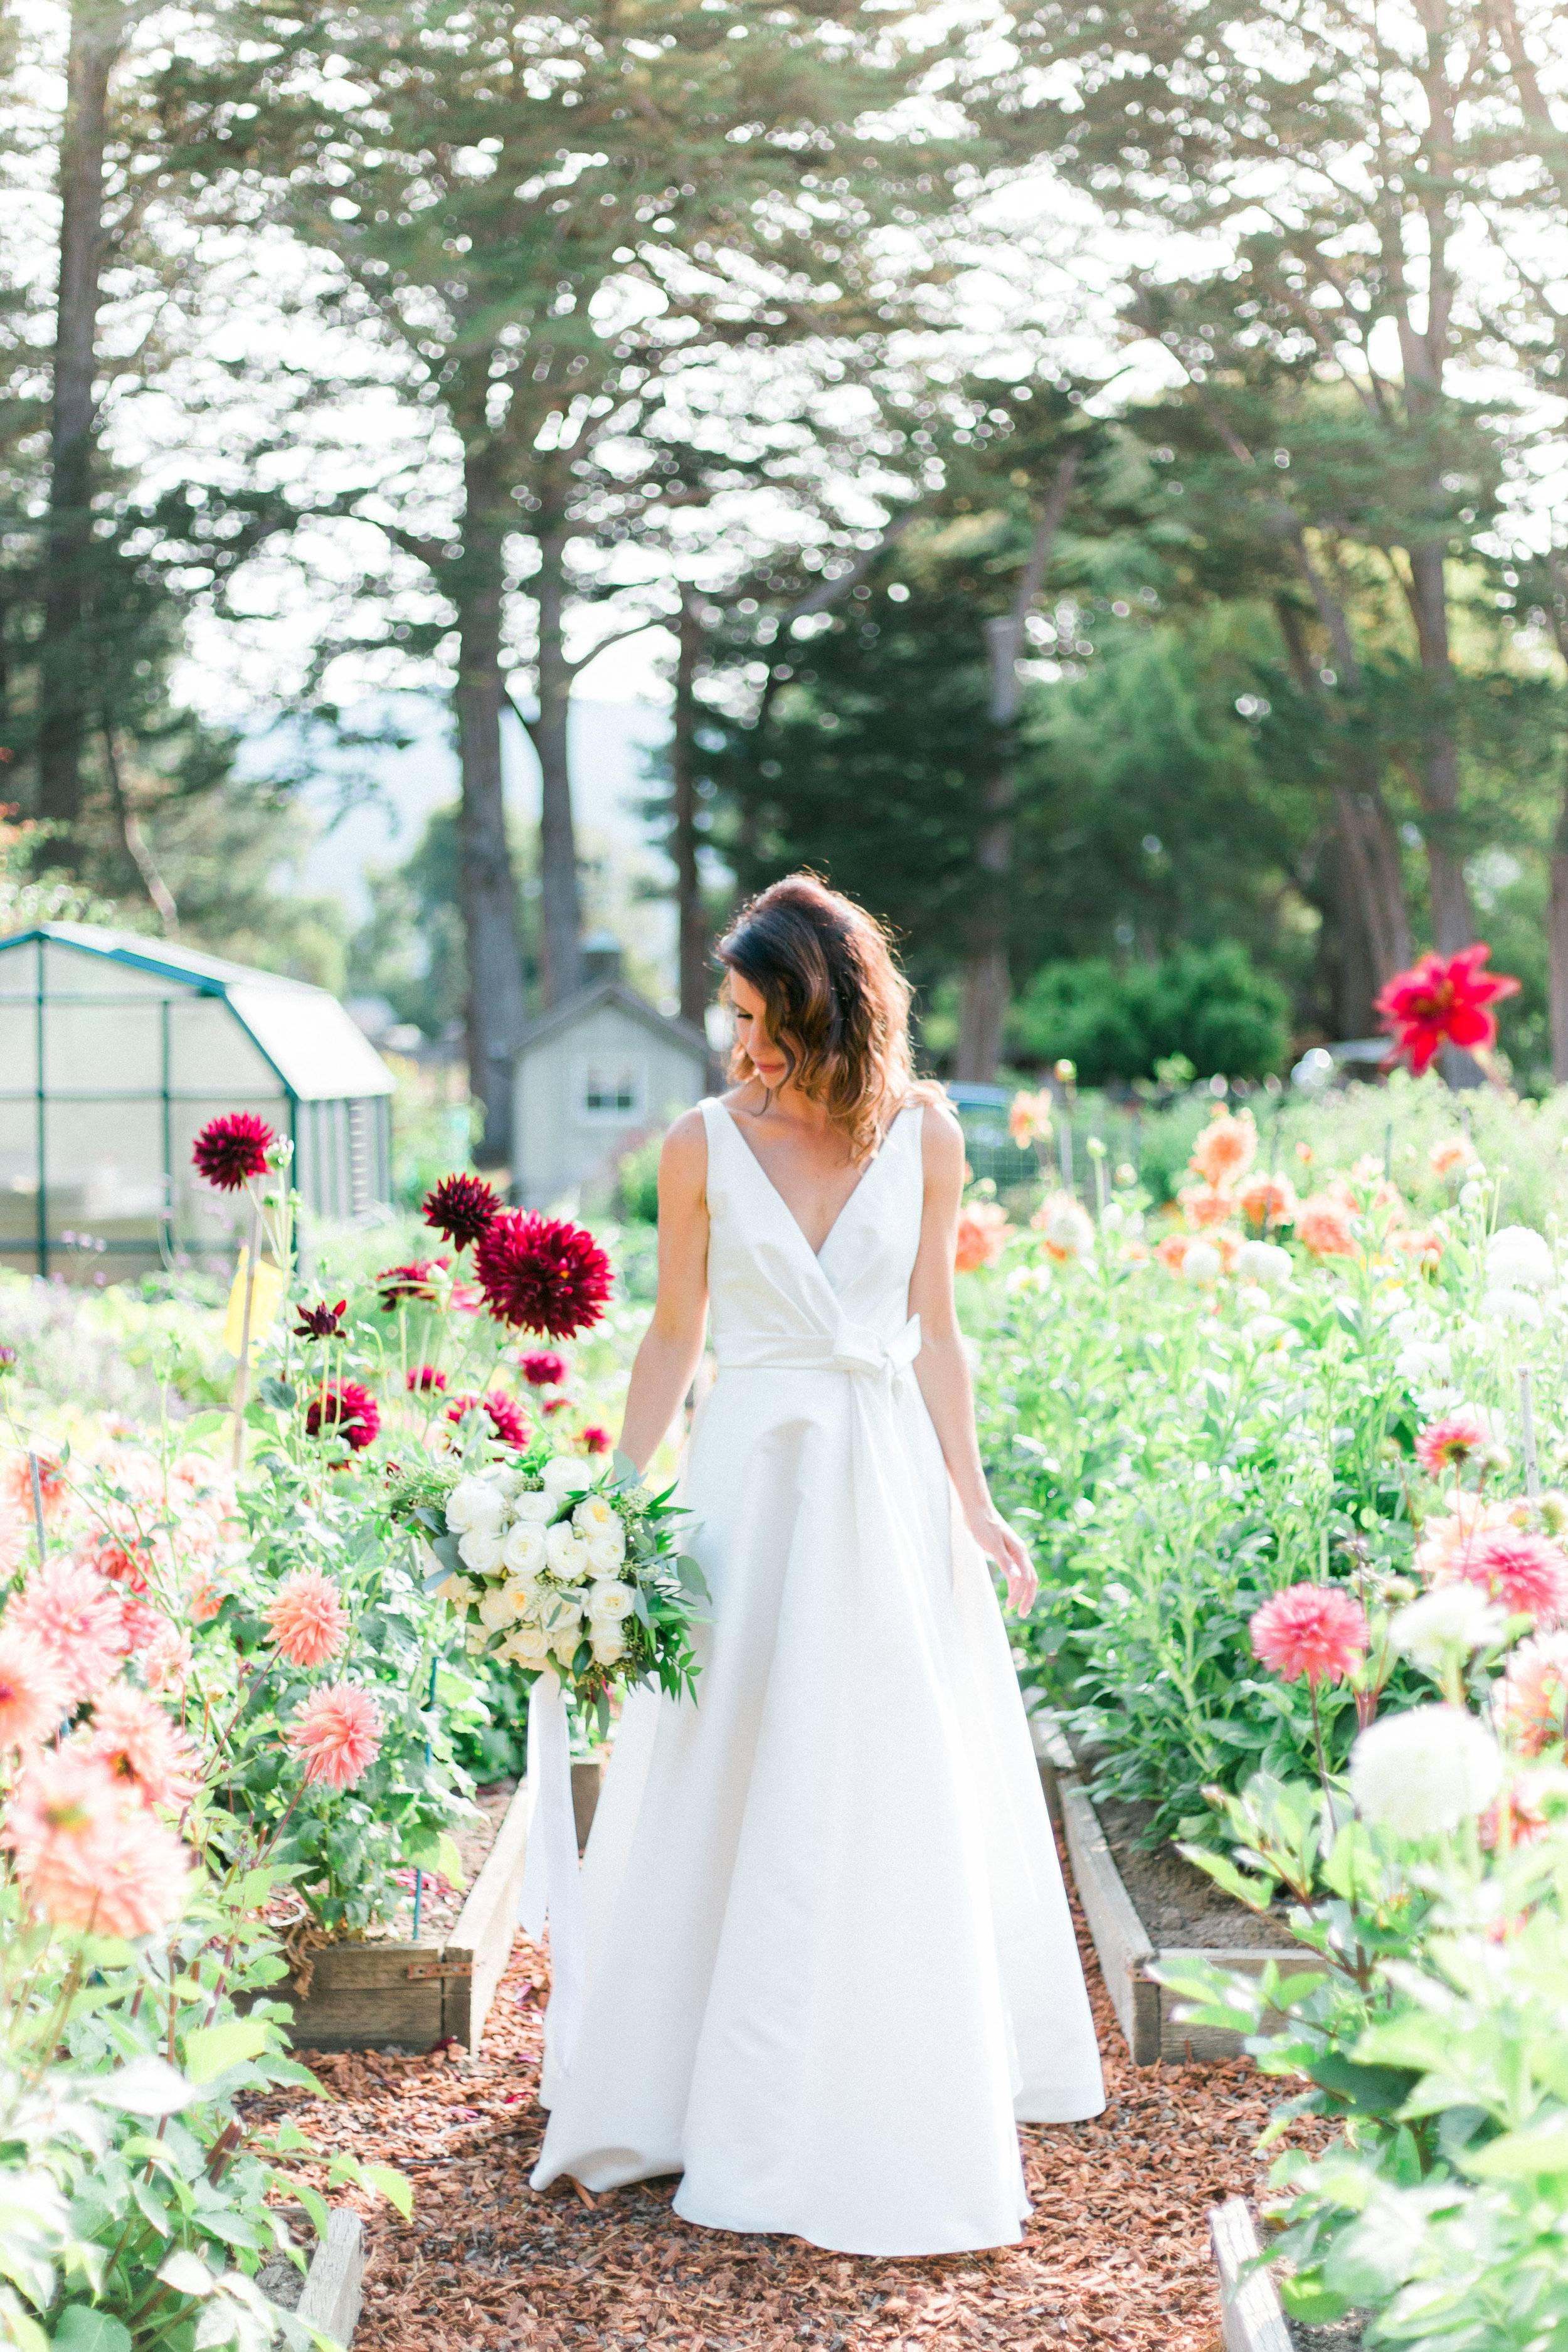 Holly-Nicholas-Wedding-by-JBJ-Pictures-228.jpg